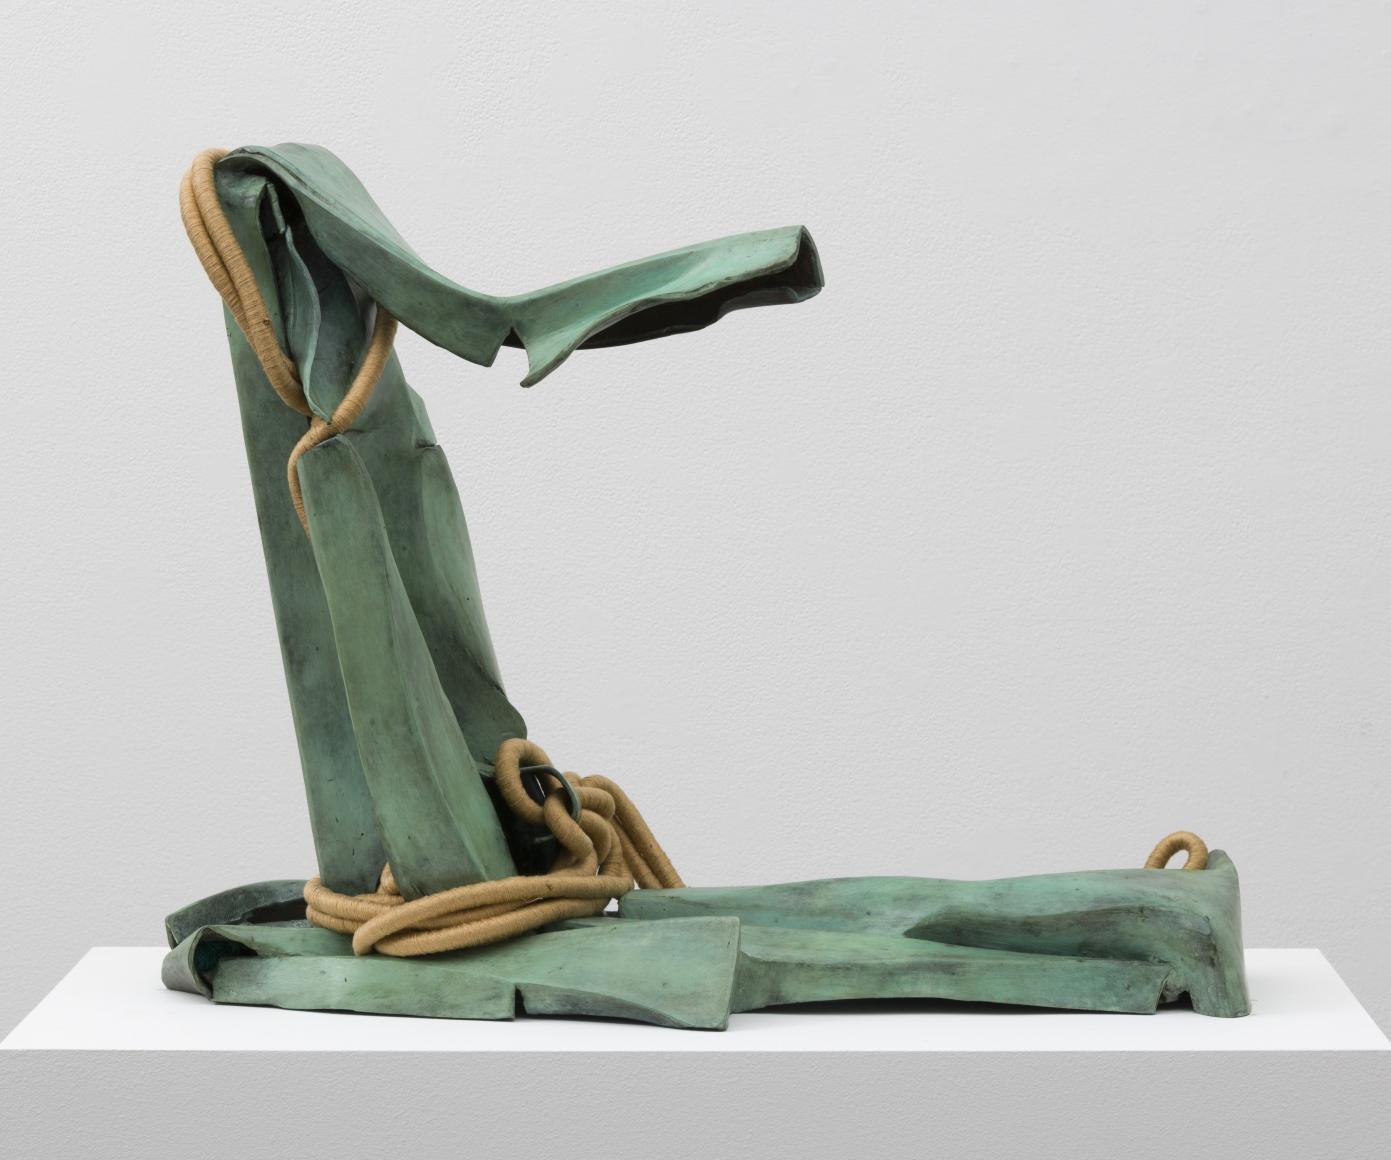 Barbara Chase-Riboud, La Musica Archeological, 2003